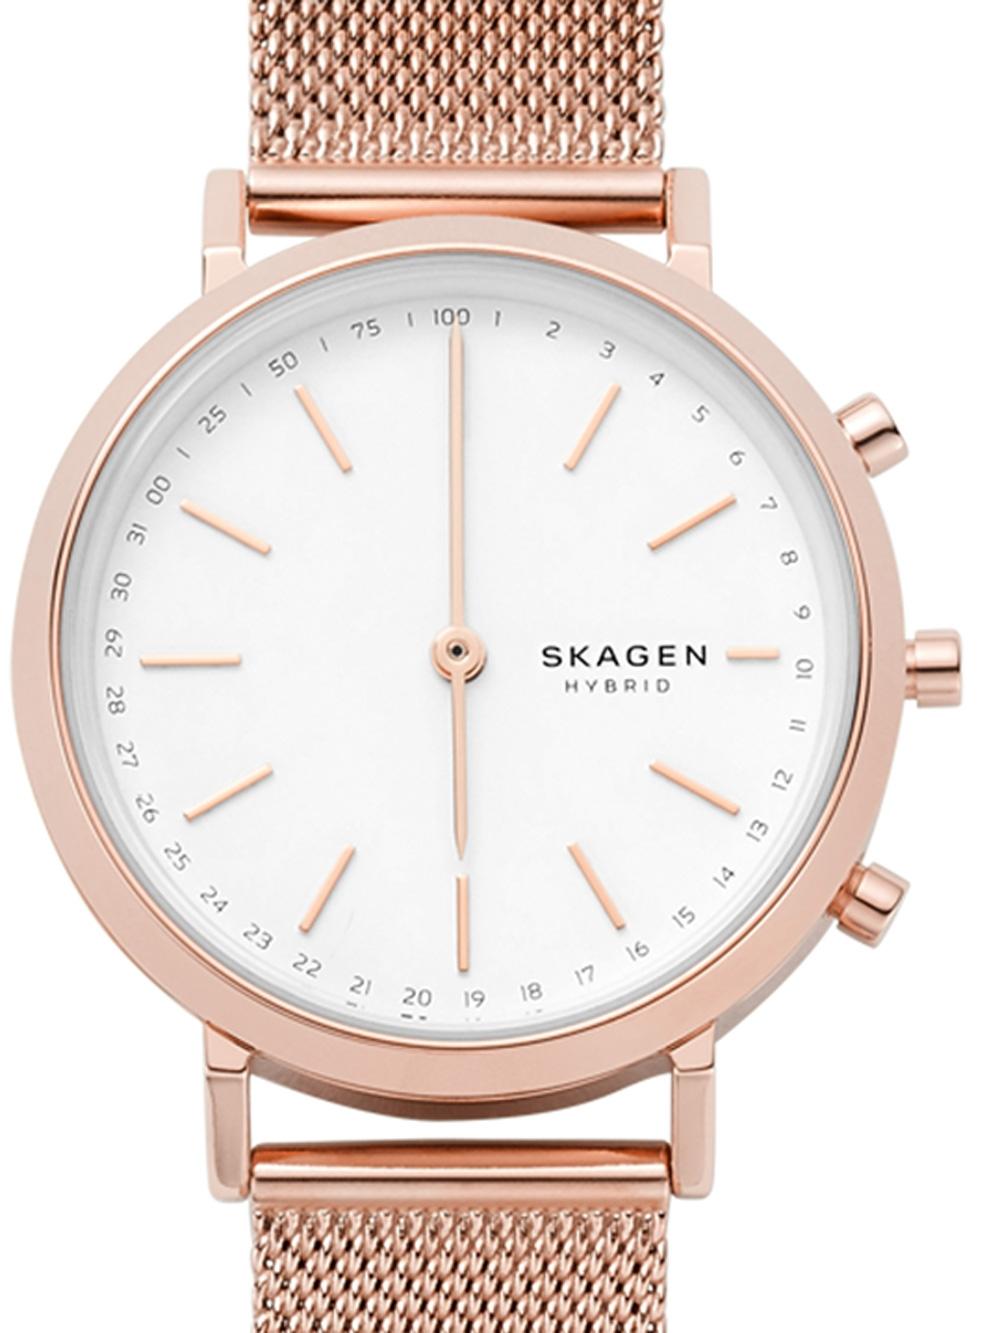 Skagen SKT1411 Hald Hybrid Smartwatch Damen 34mm 3ATM